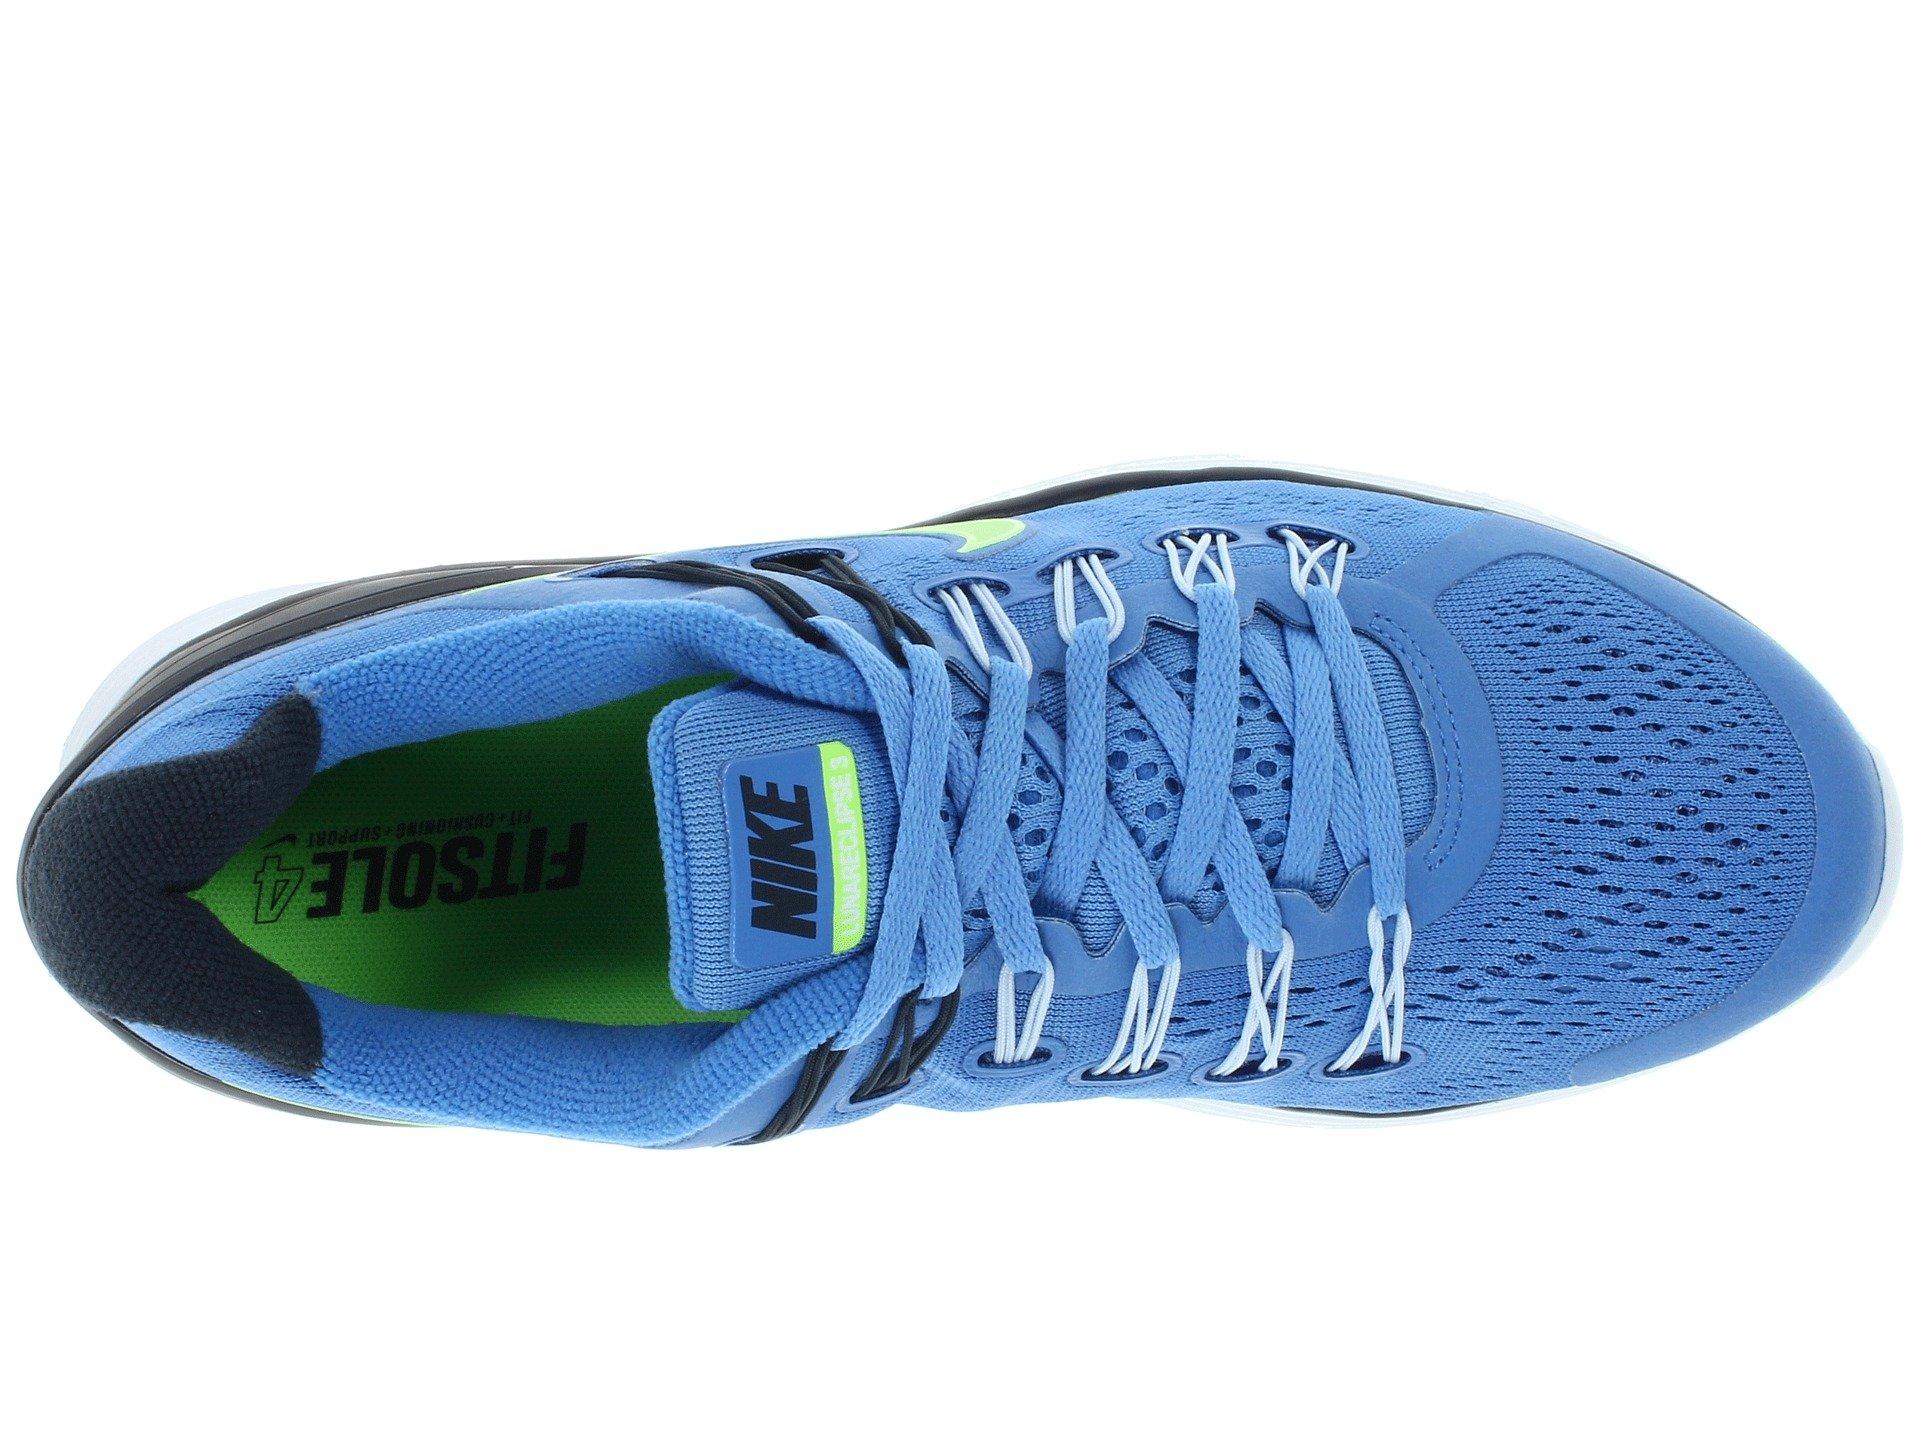 6e75997bc1e1 Nike Lunareclipse+ 3 Women s Distance Blue Armory Navy Flash Lime ...